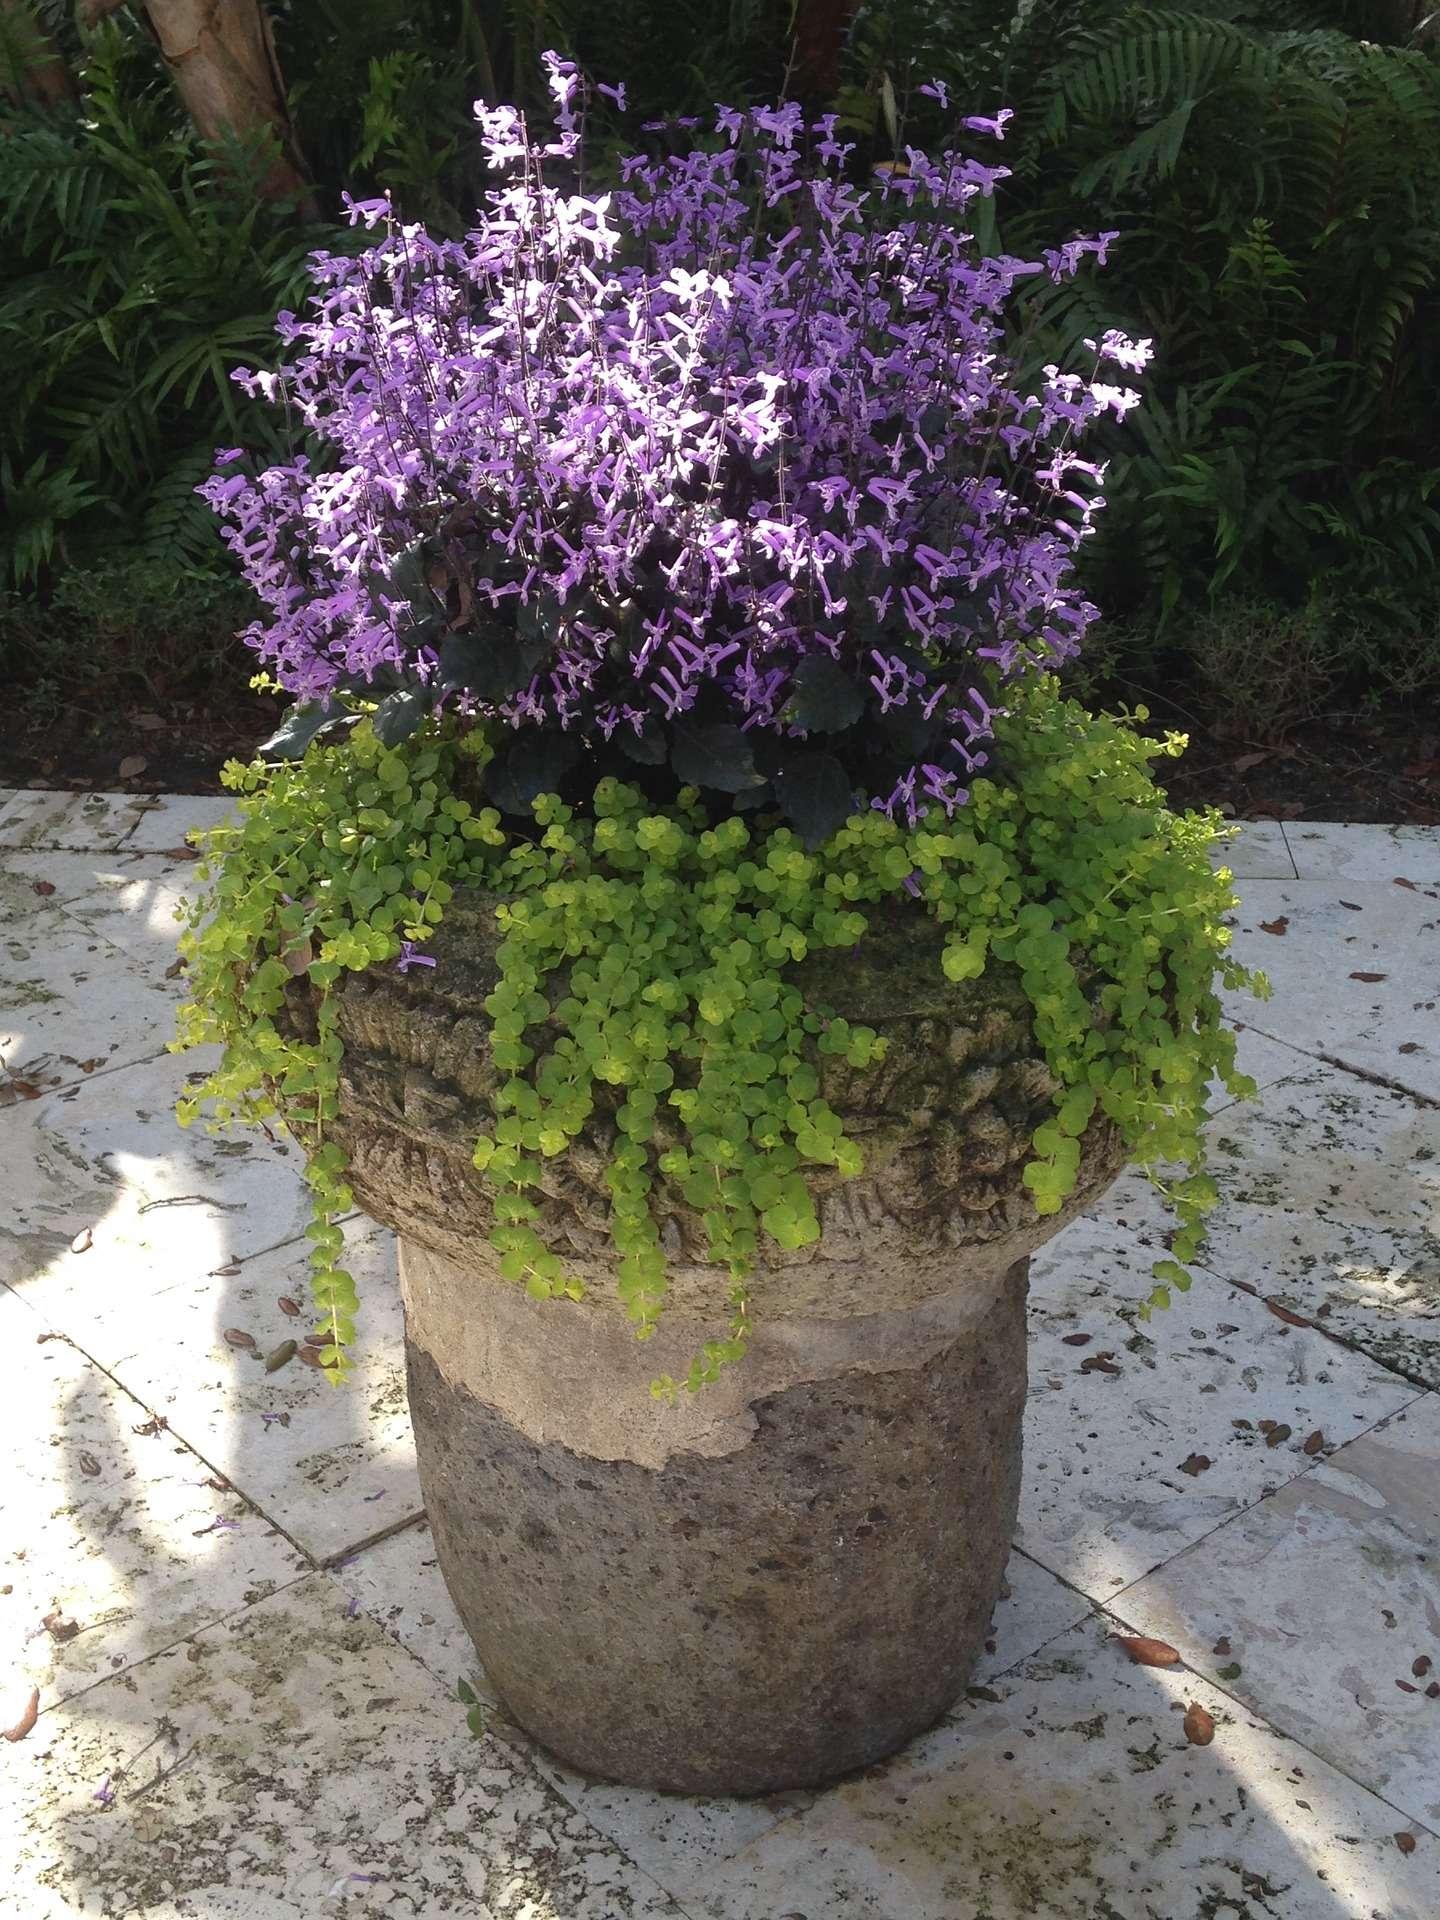 container-garden-1199822_1920.jpg